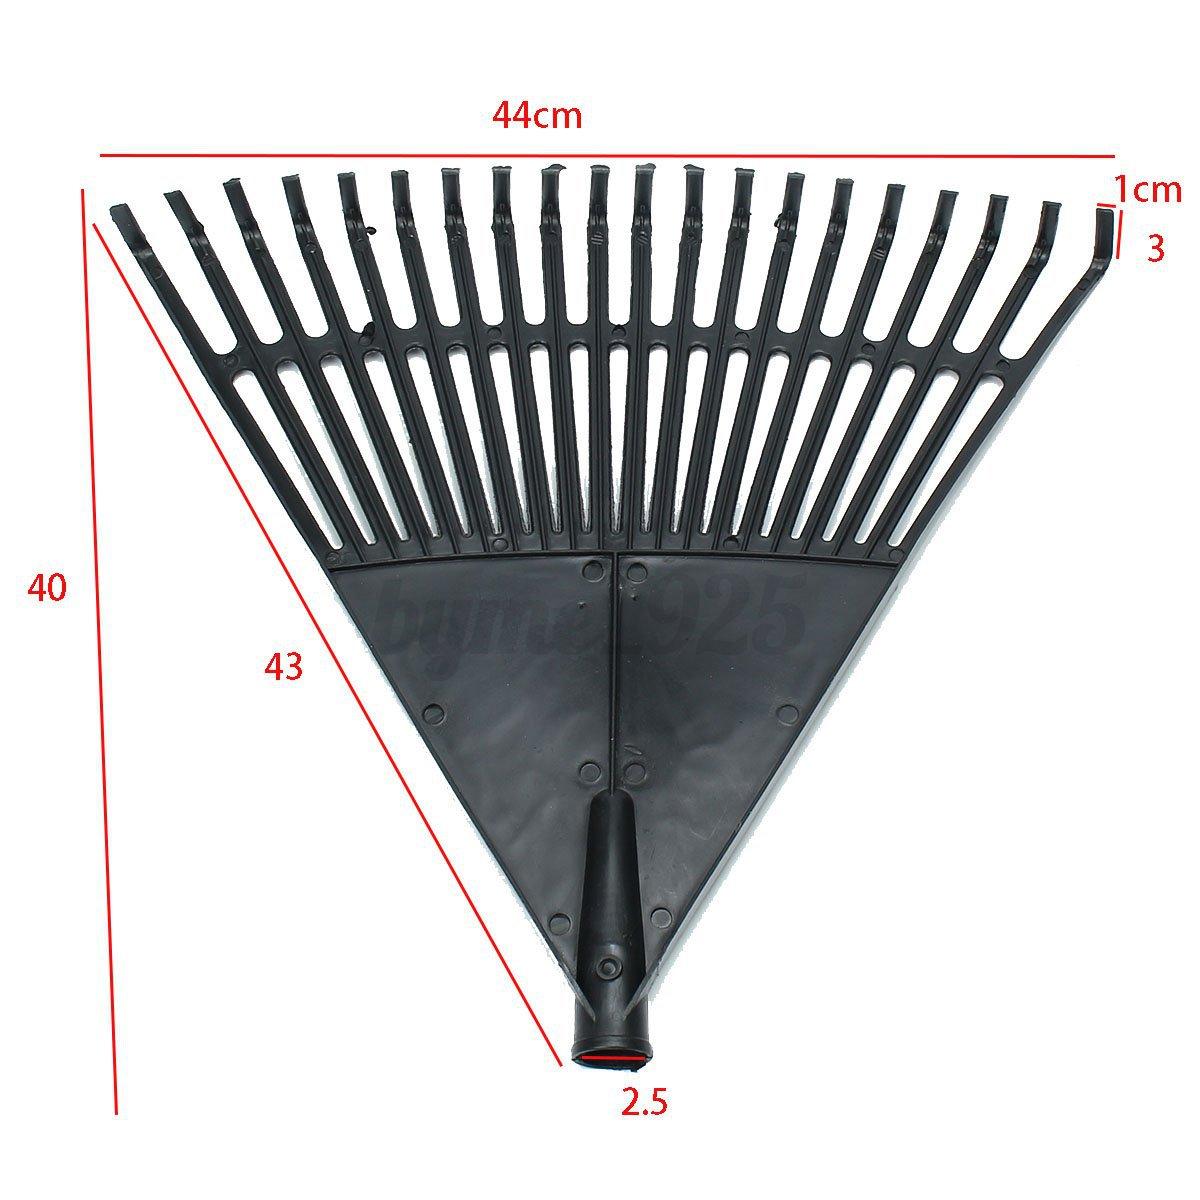 3 types 20 22 teeth plastic garden yard farm rake head for Heavy duty garden rake